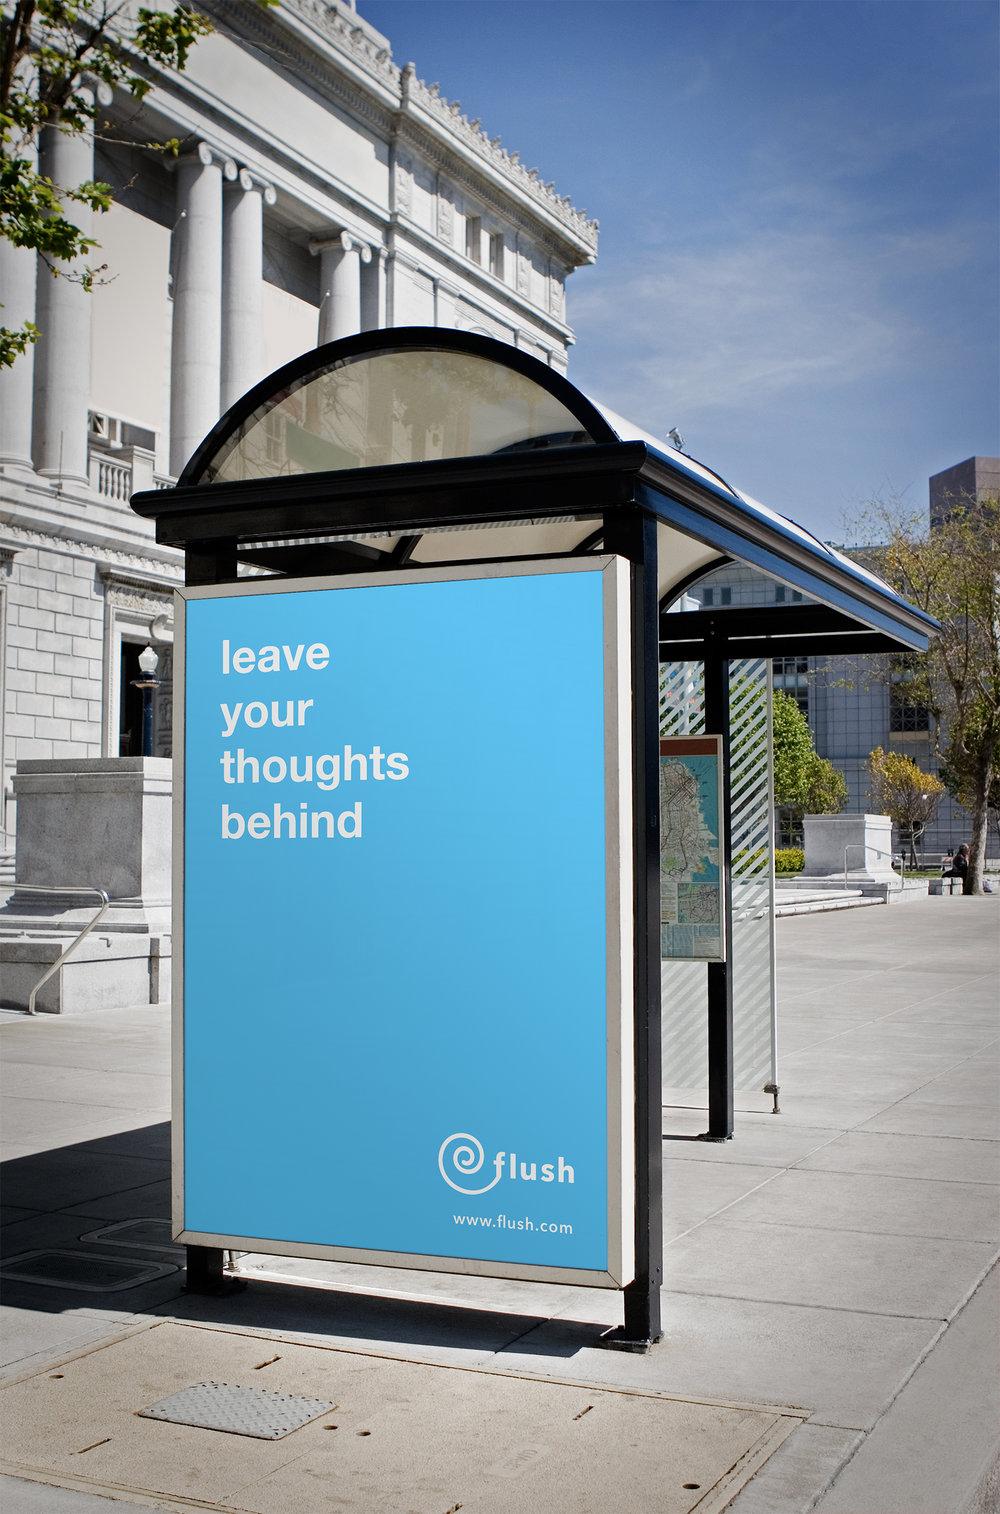 Flush_campaign_bus_stop.jpg